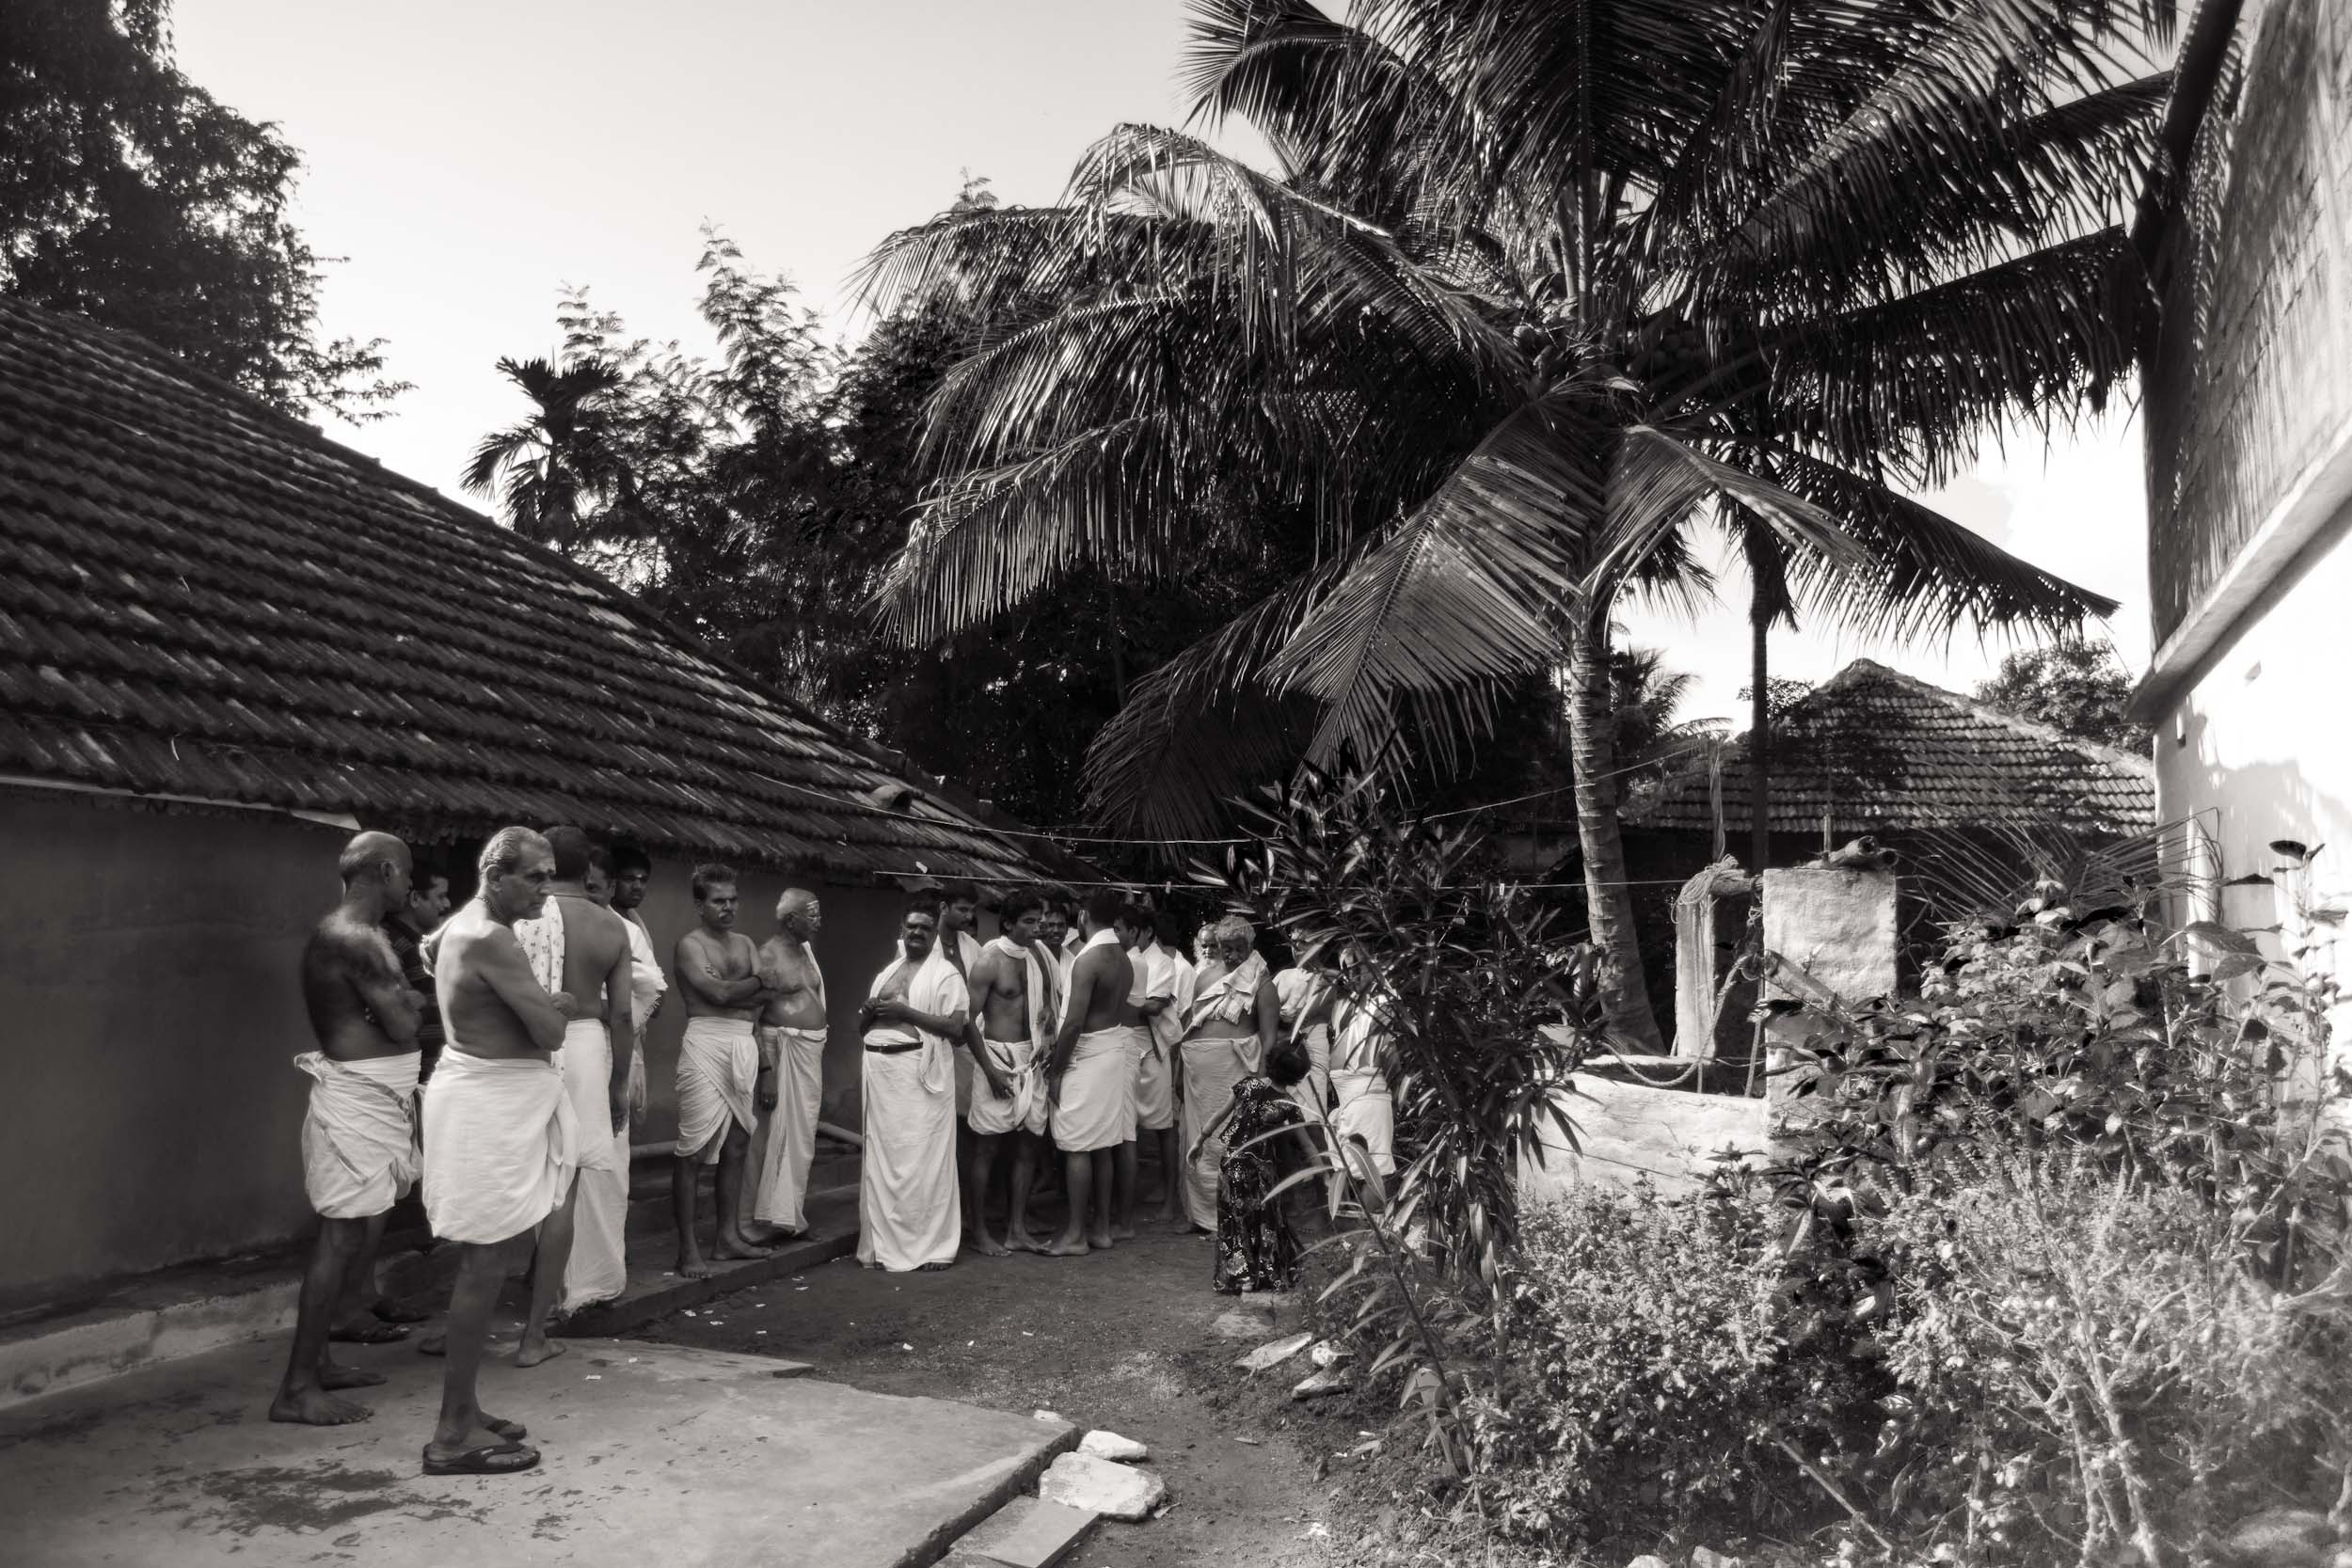 Sindhur_Photography_Travel_People_Kerala-1.JPG